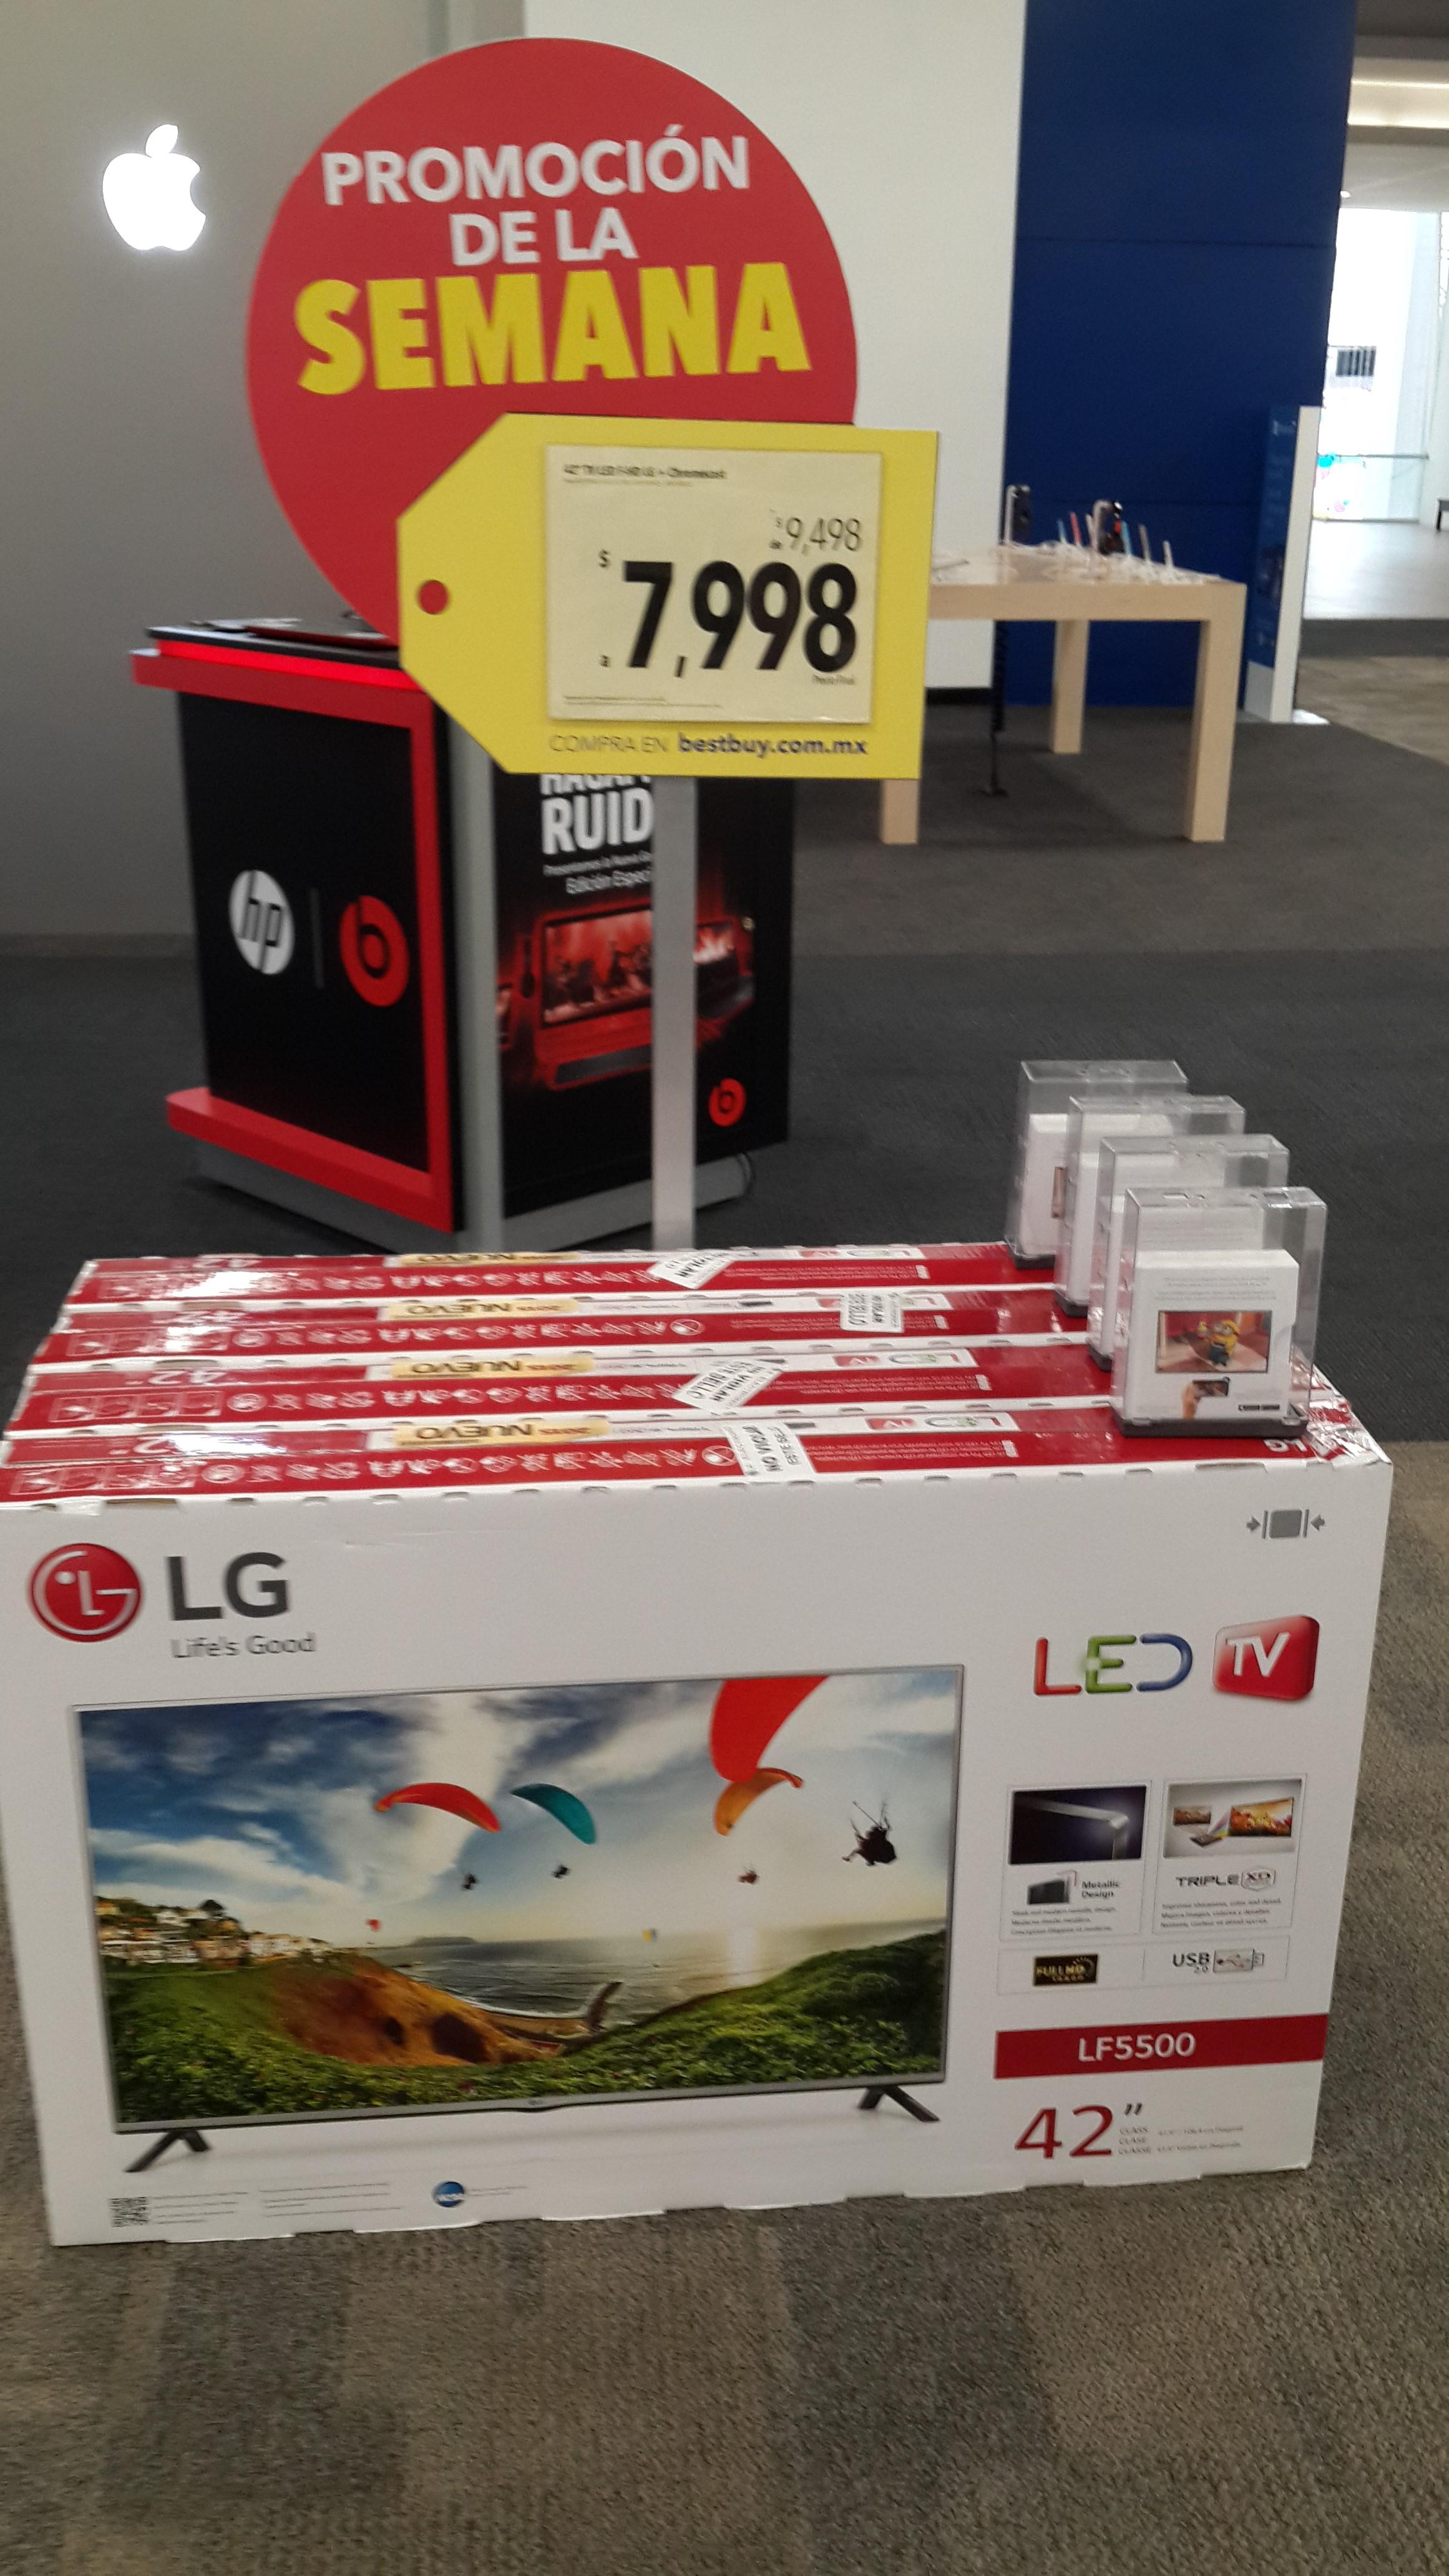 "Bestbuy: LG TV LED 42"" $7,998"